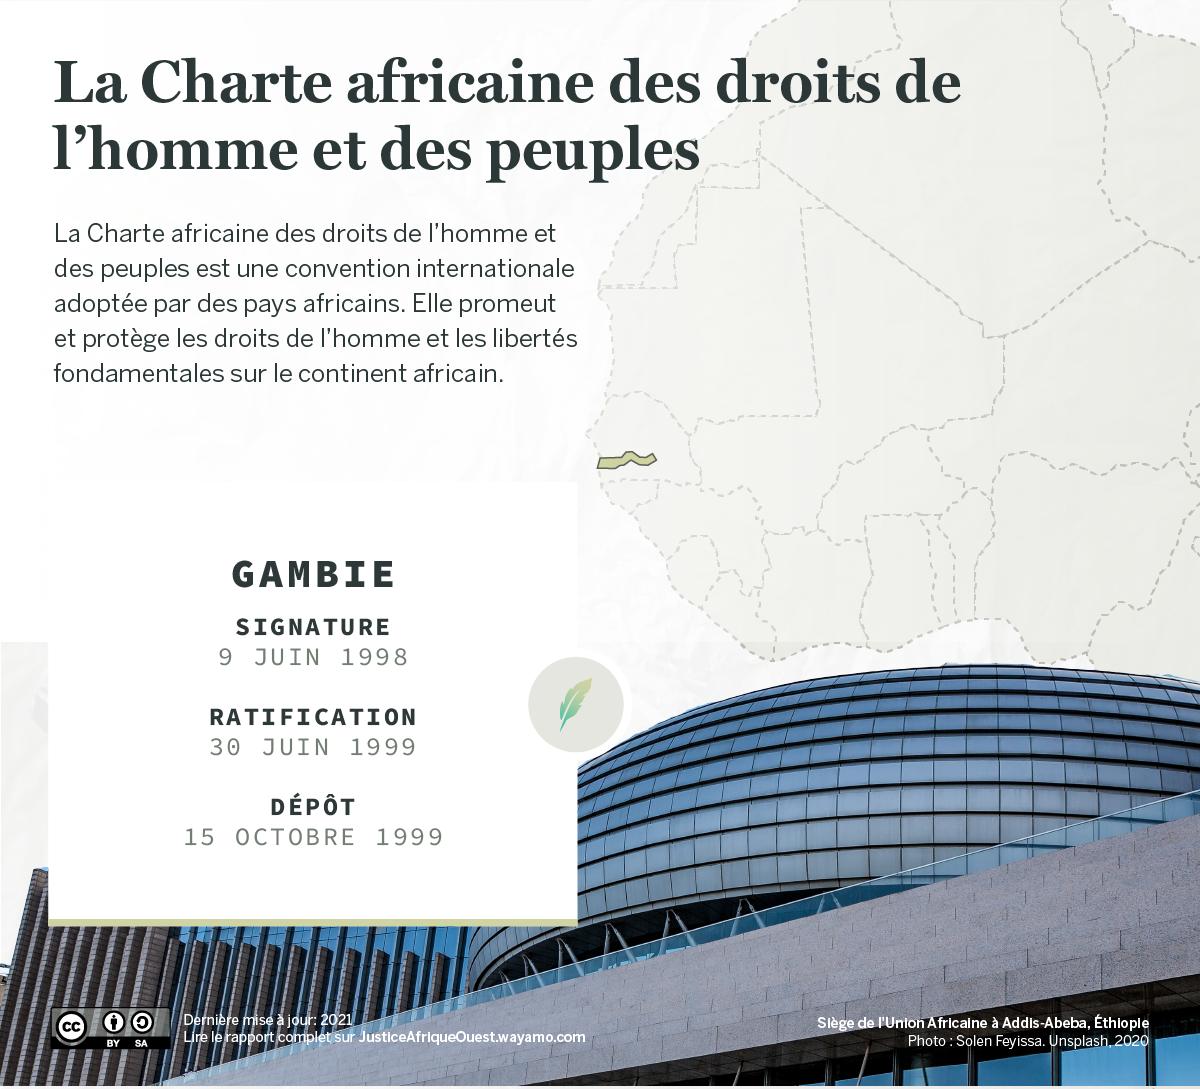 GAMBIE_Charte africaine - Wayamo Foundation (CC BY-SA 4.0)